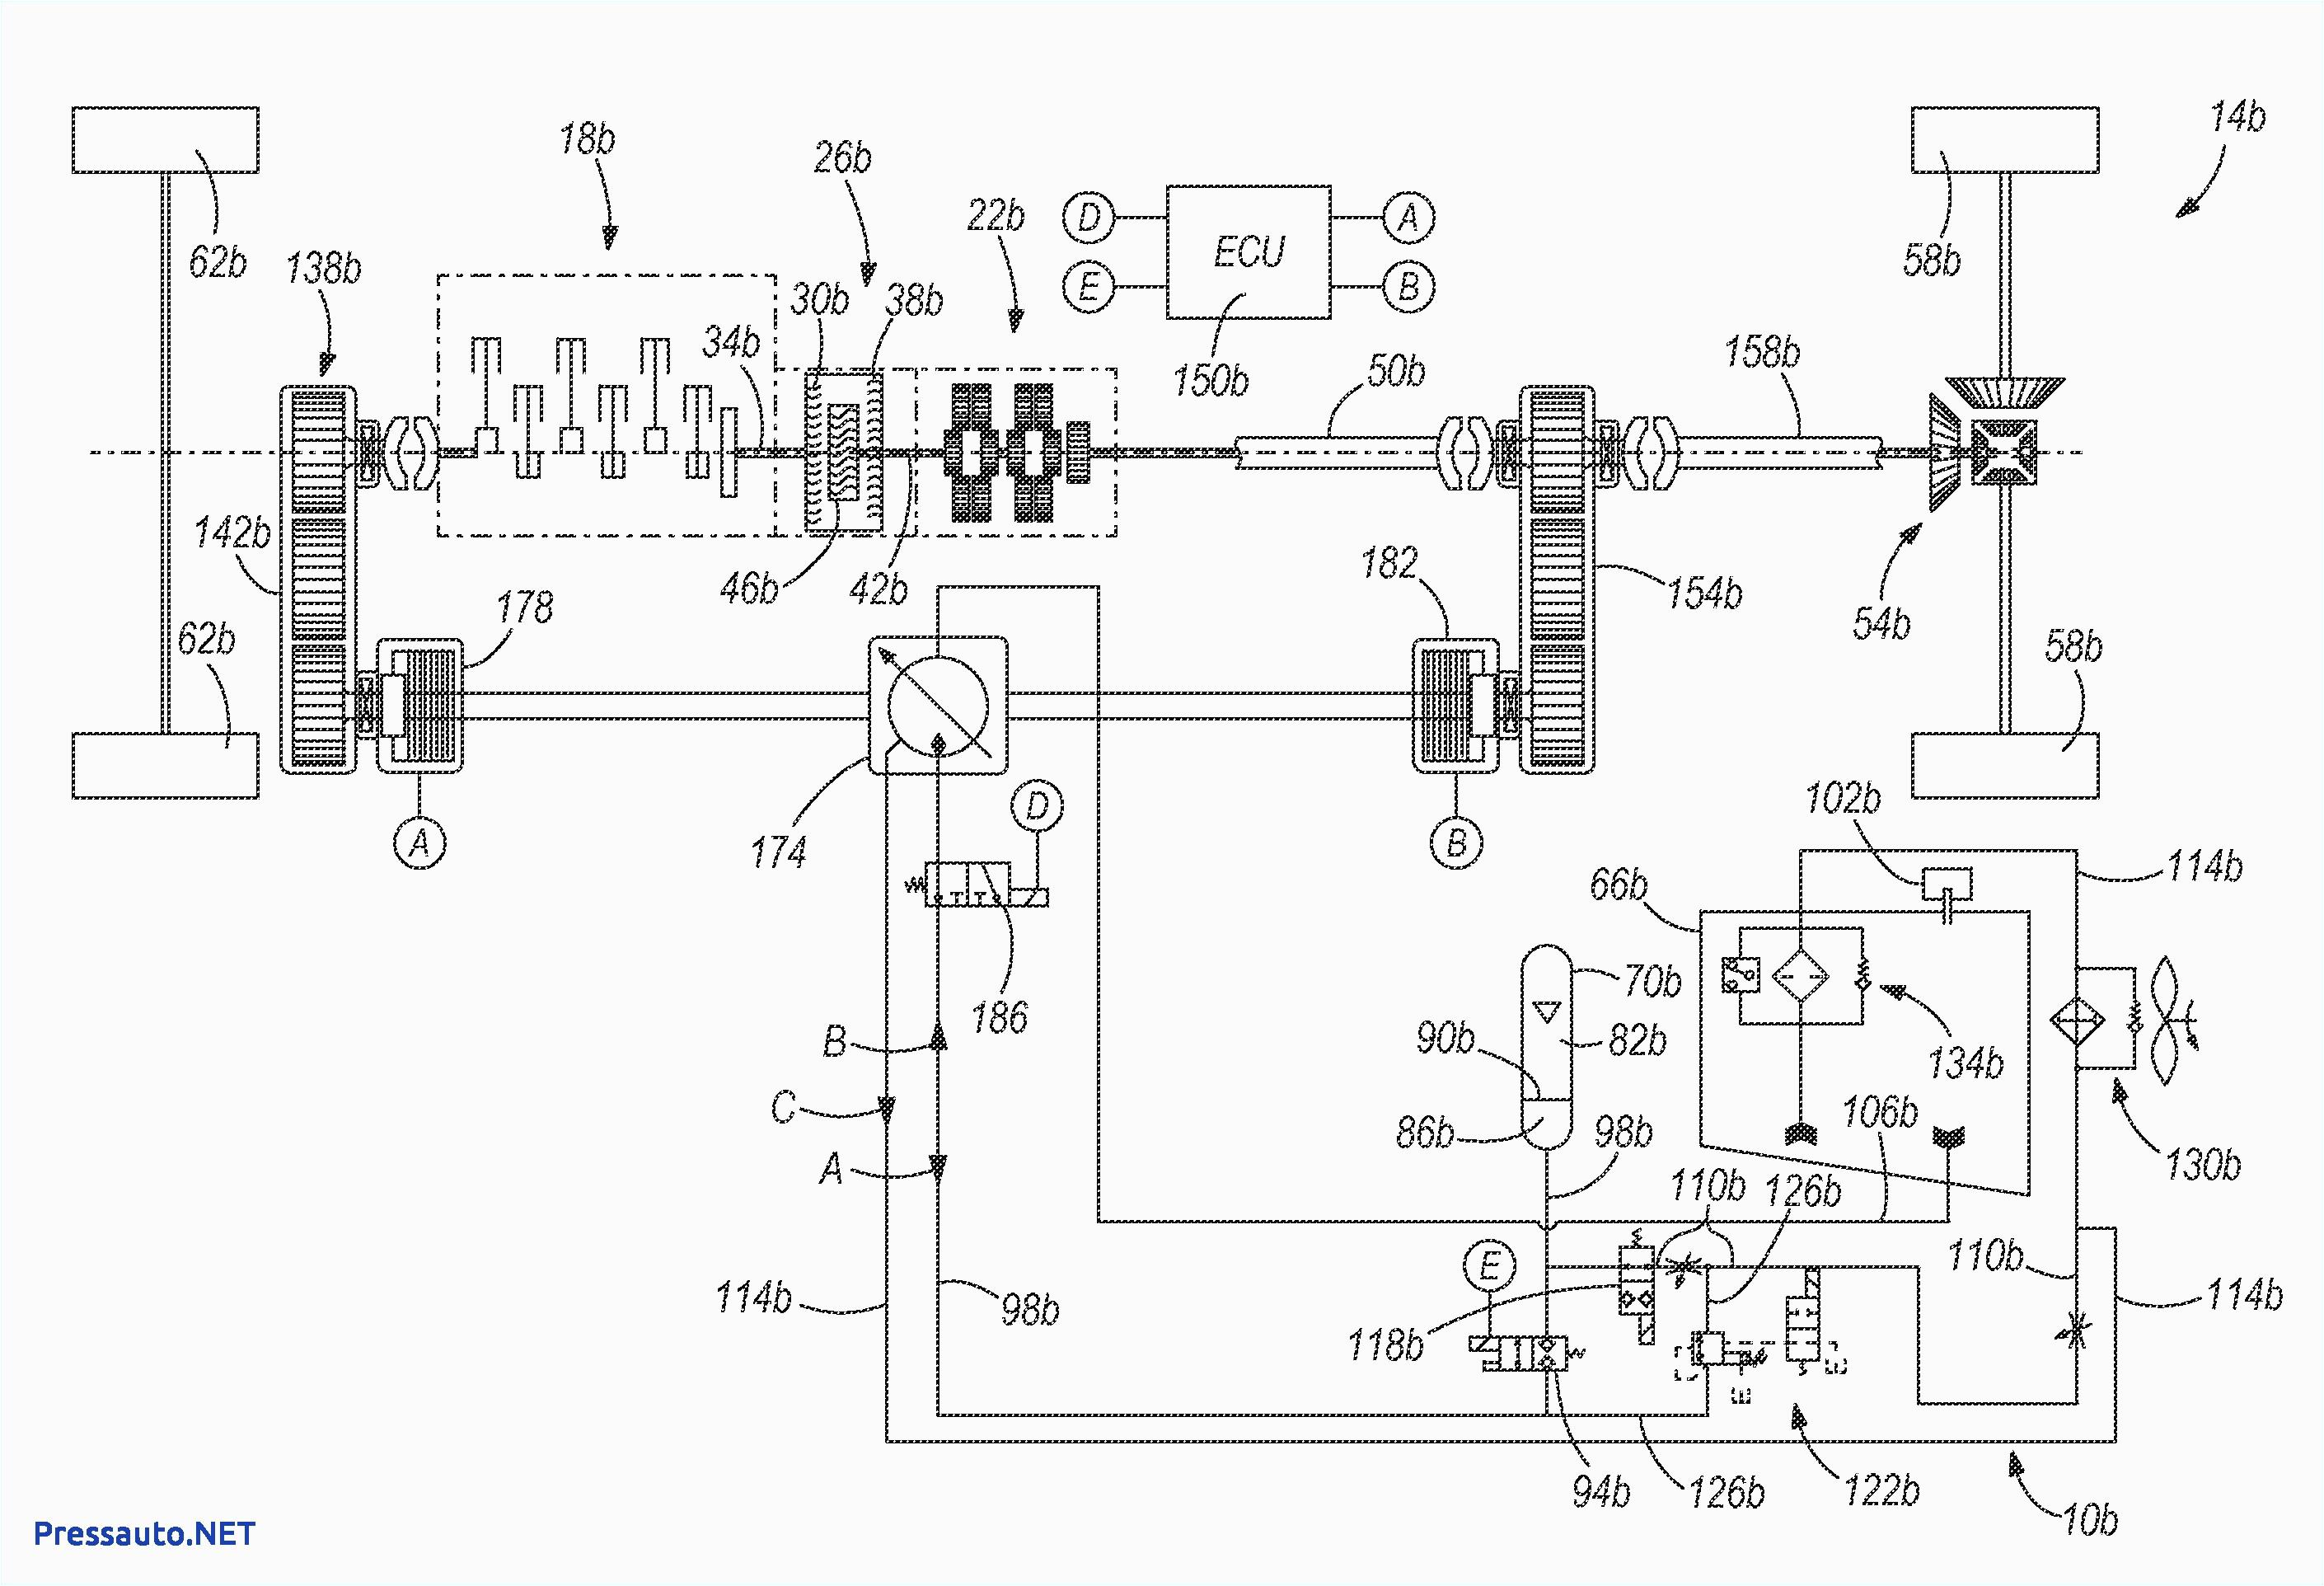 wiring diagram 3500a816 wiring diagram autovehiclewiring diagram 3500a816 wiring diagram basic3500a816 wiring diagram wiring diagramwiring diagram